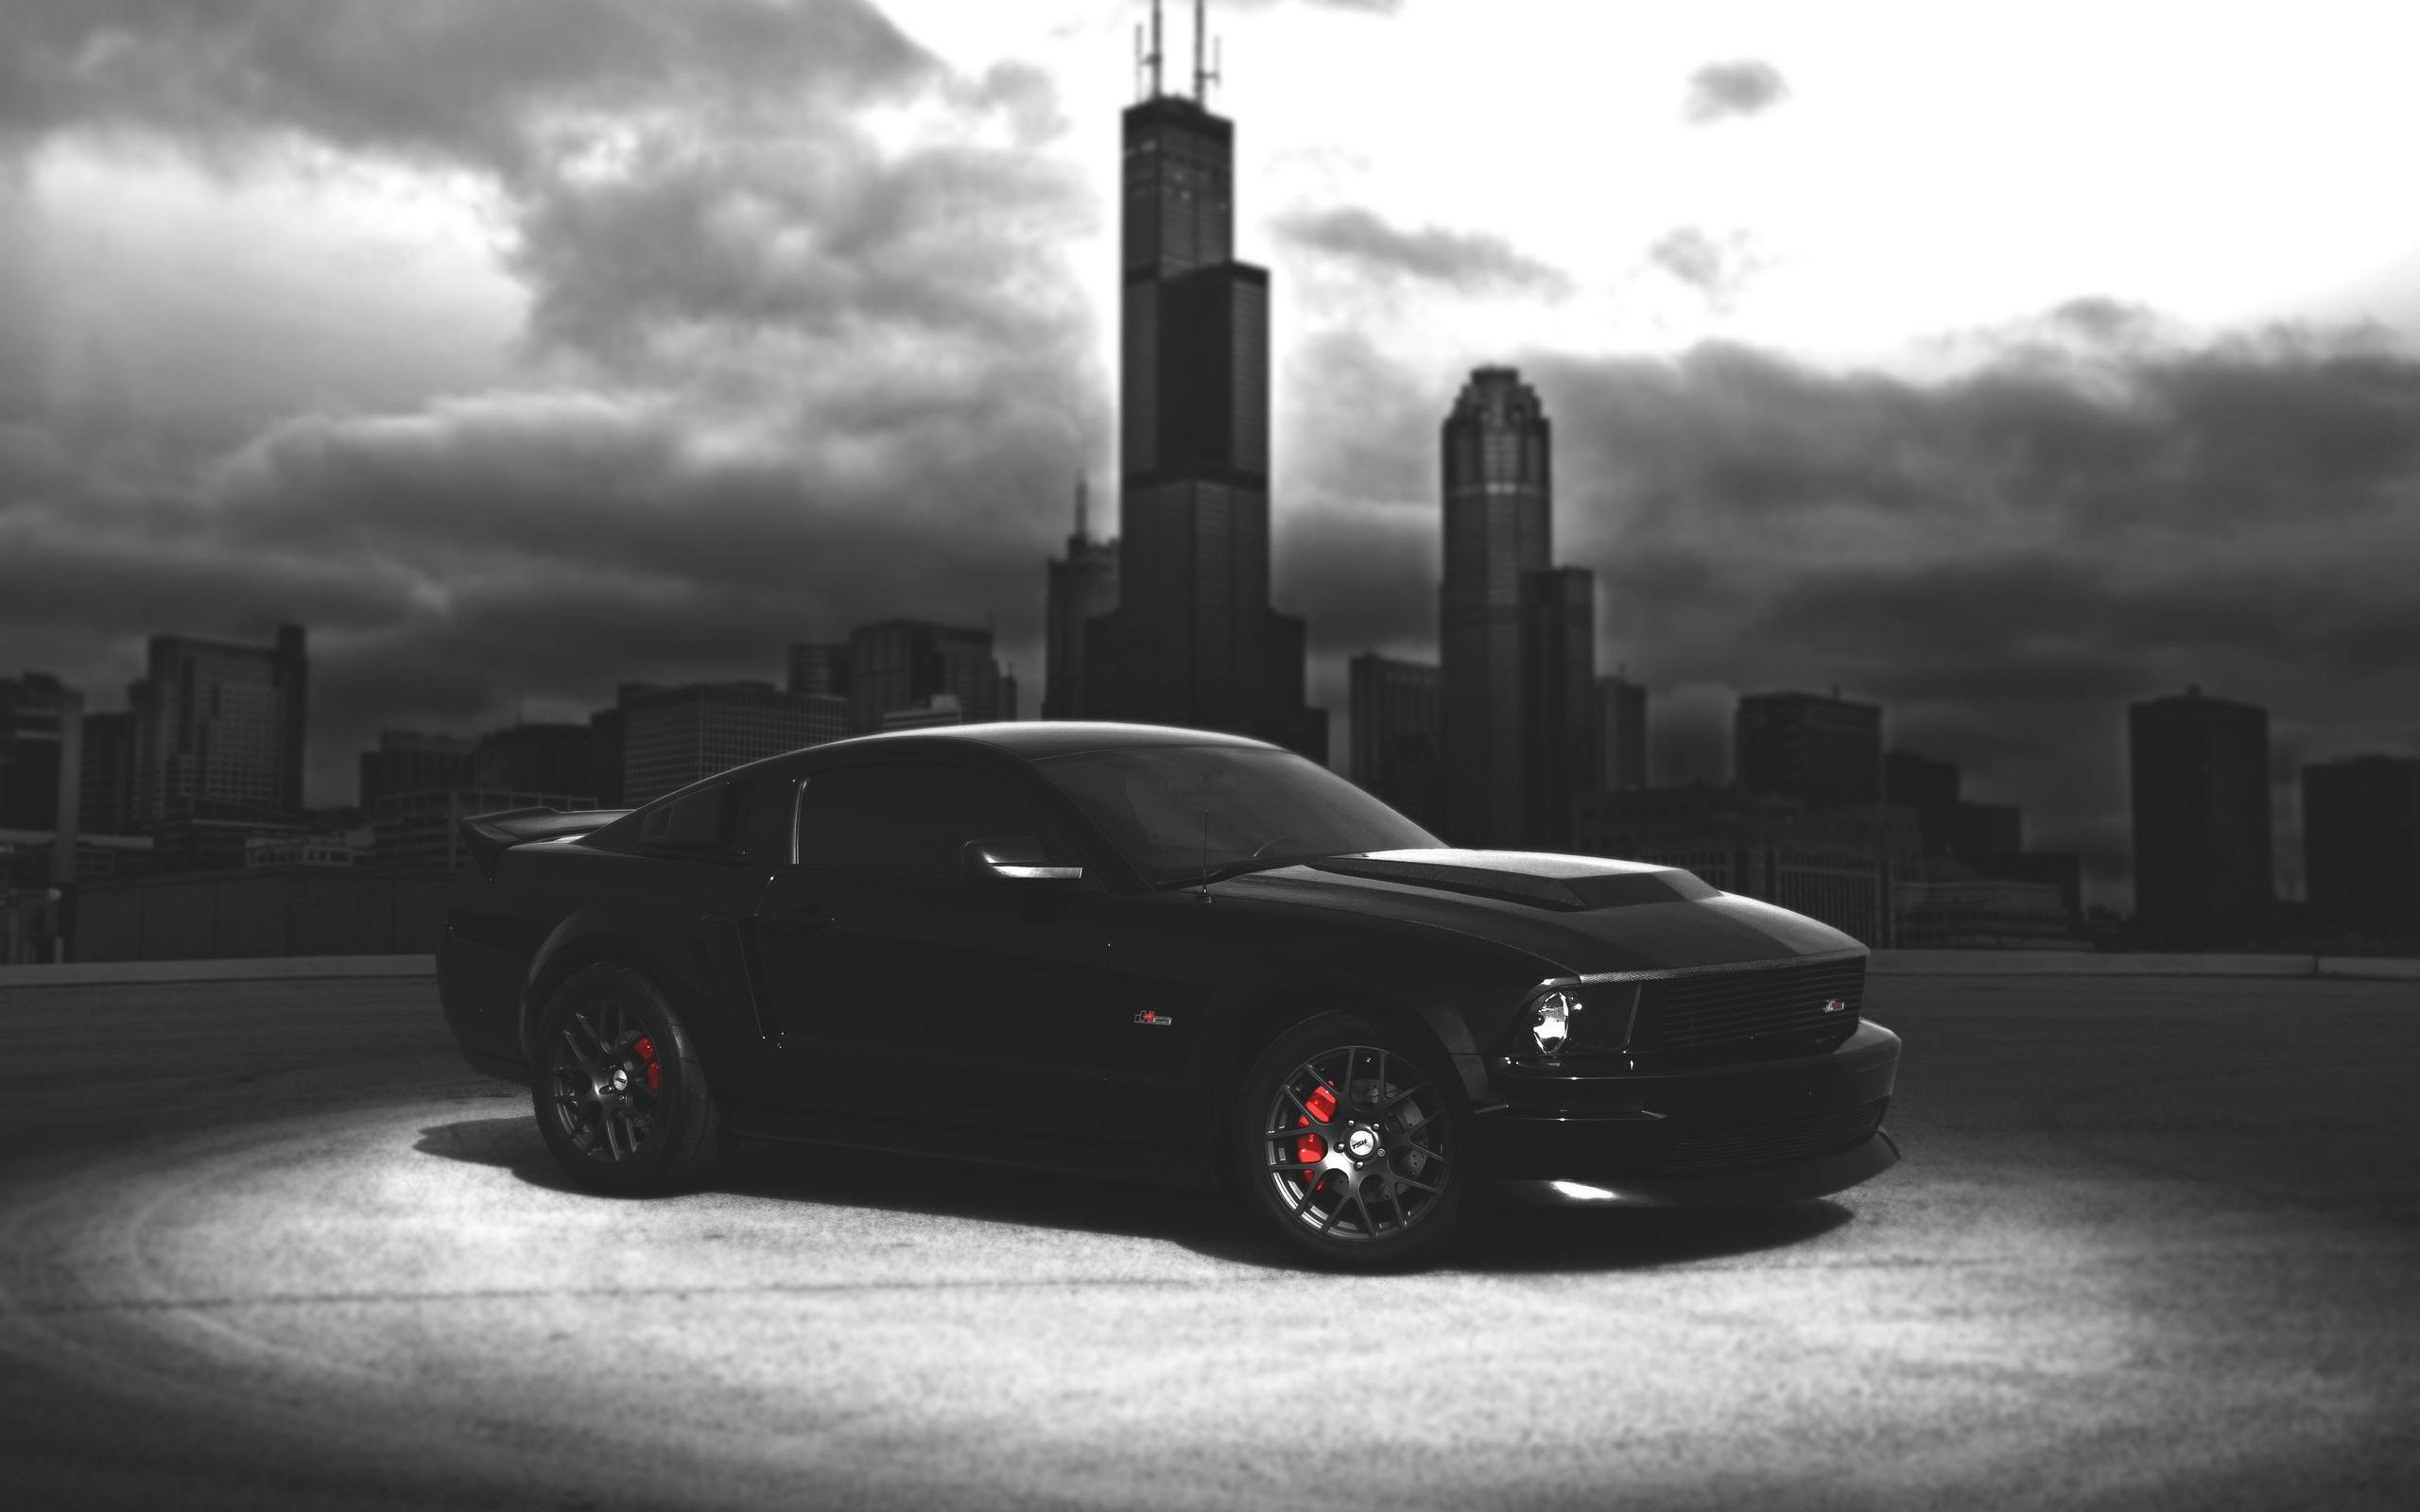 Ford Mustang Black Car Fondos Fondos De Pantalla